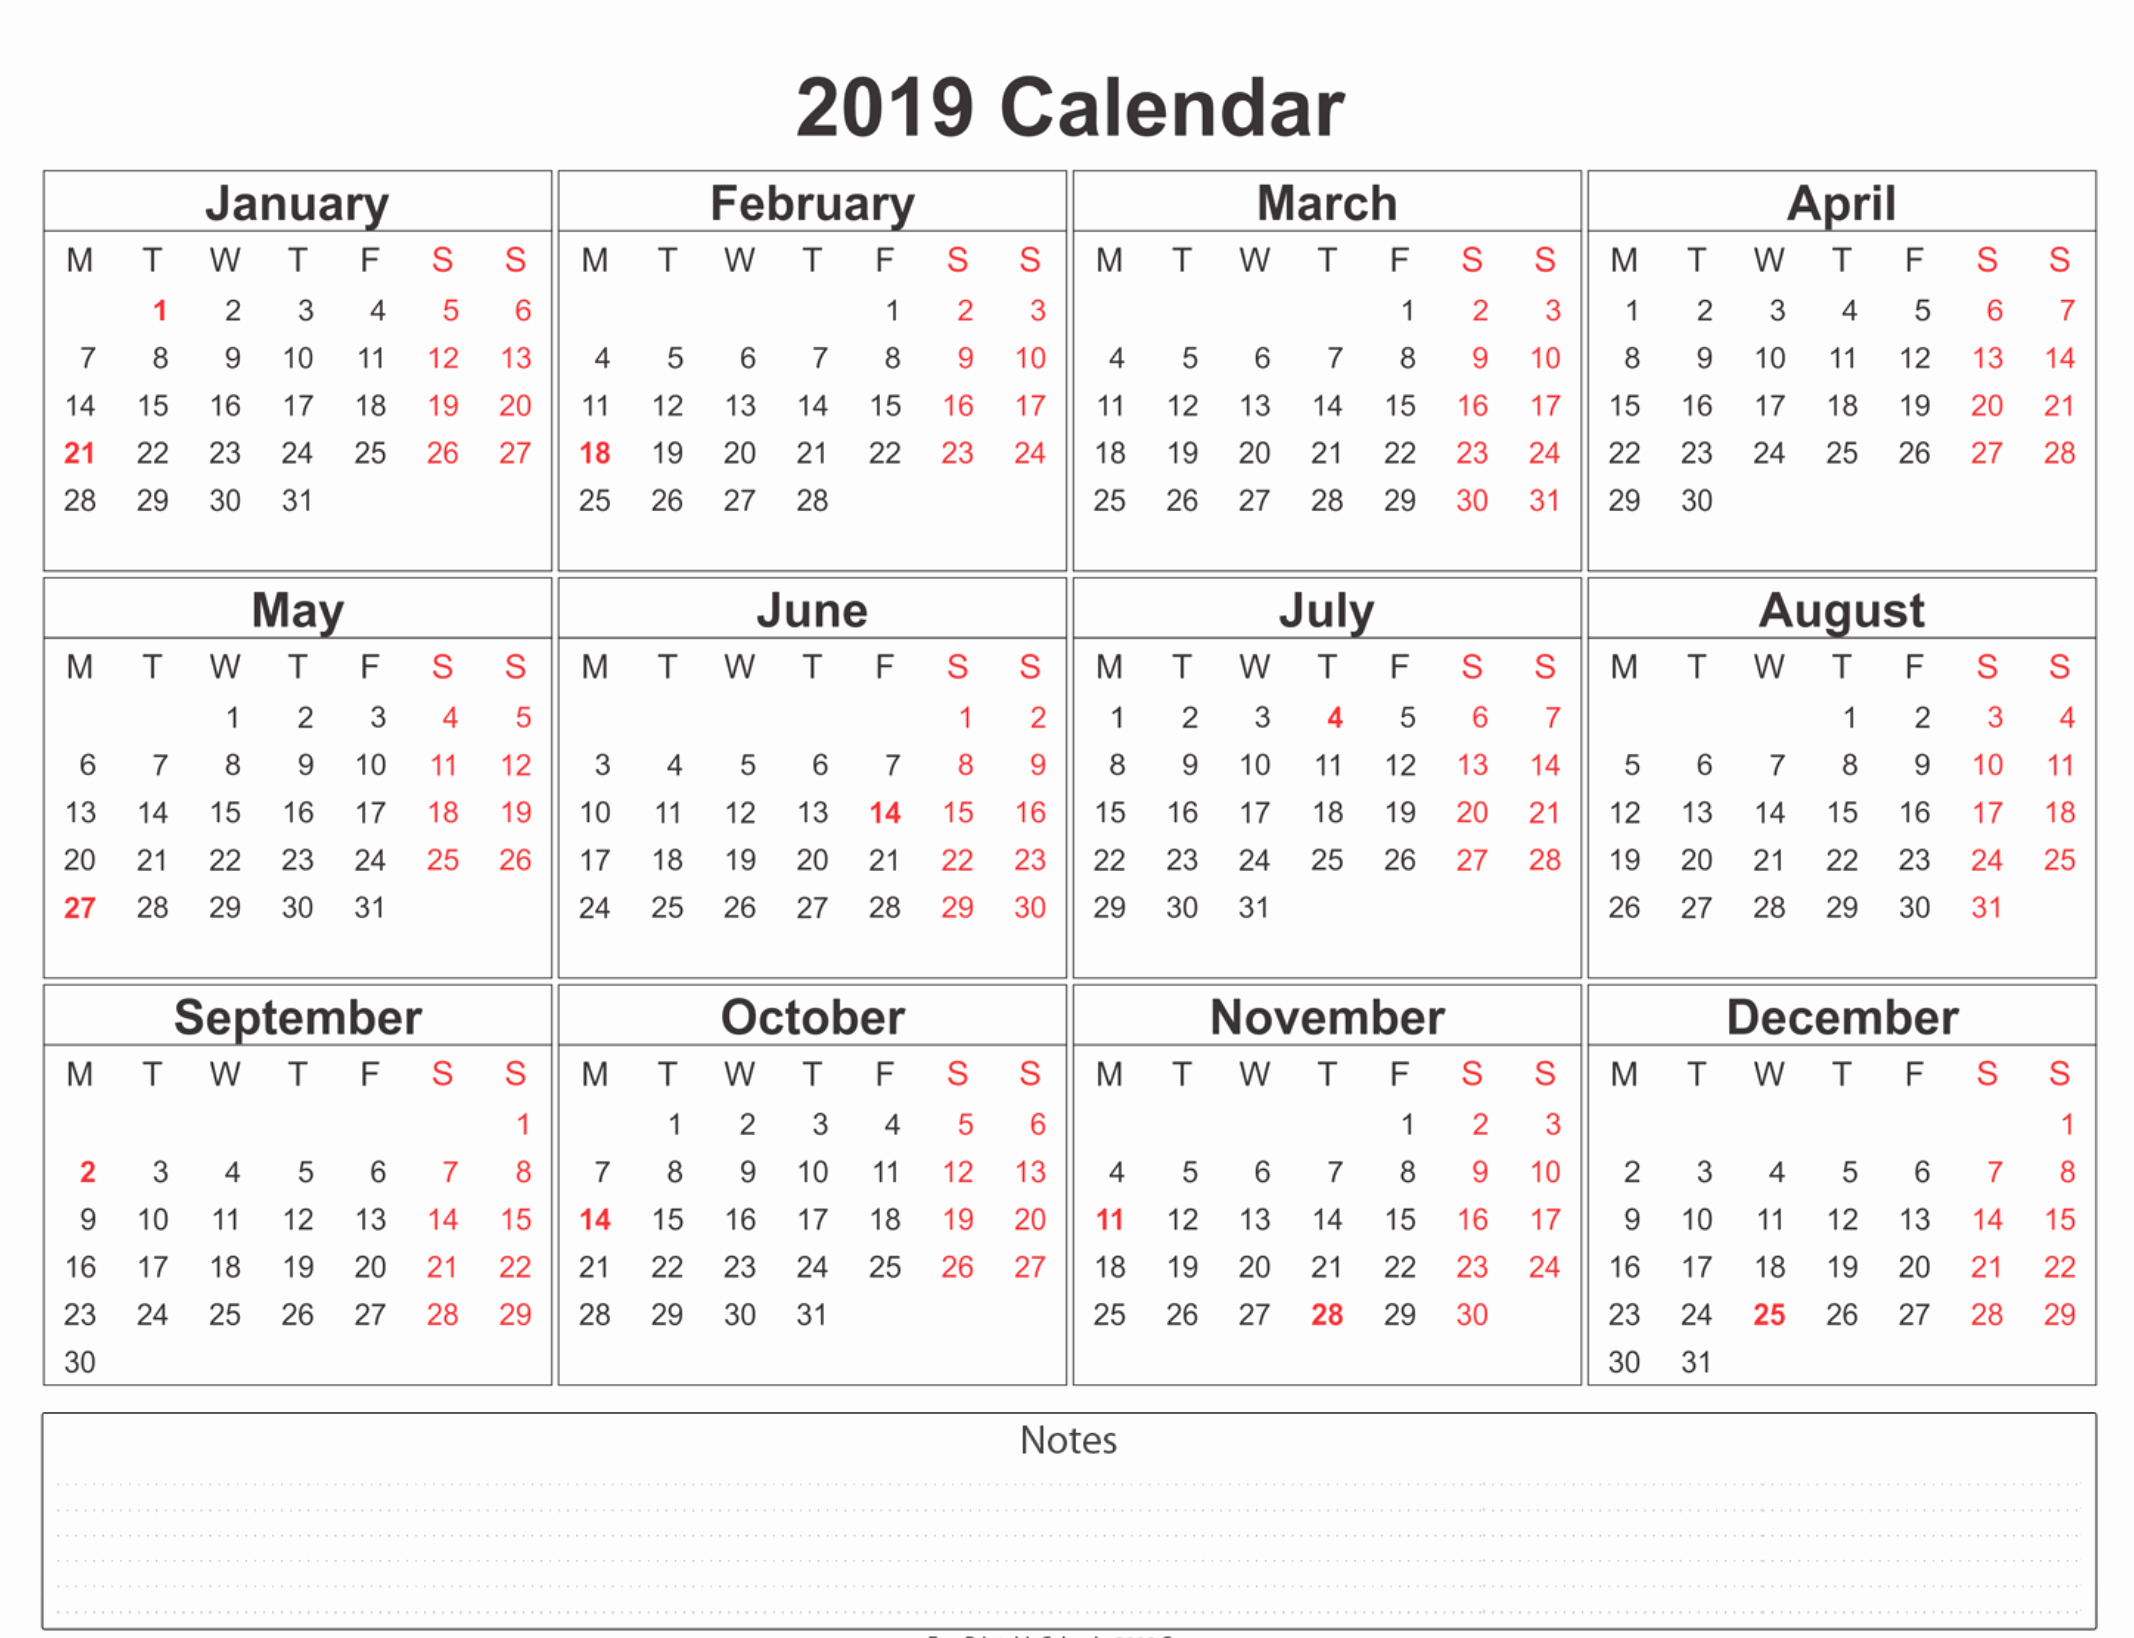 Free 2019 Calendar Template Inspirational 2019 Calendar Amazonaws